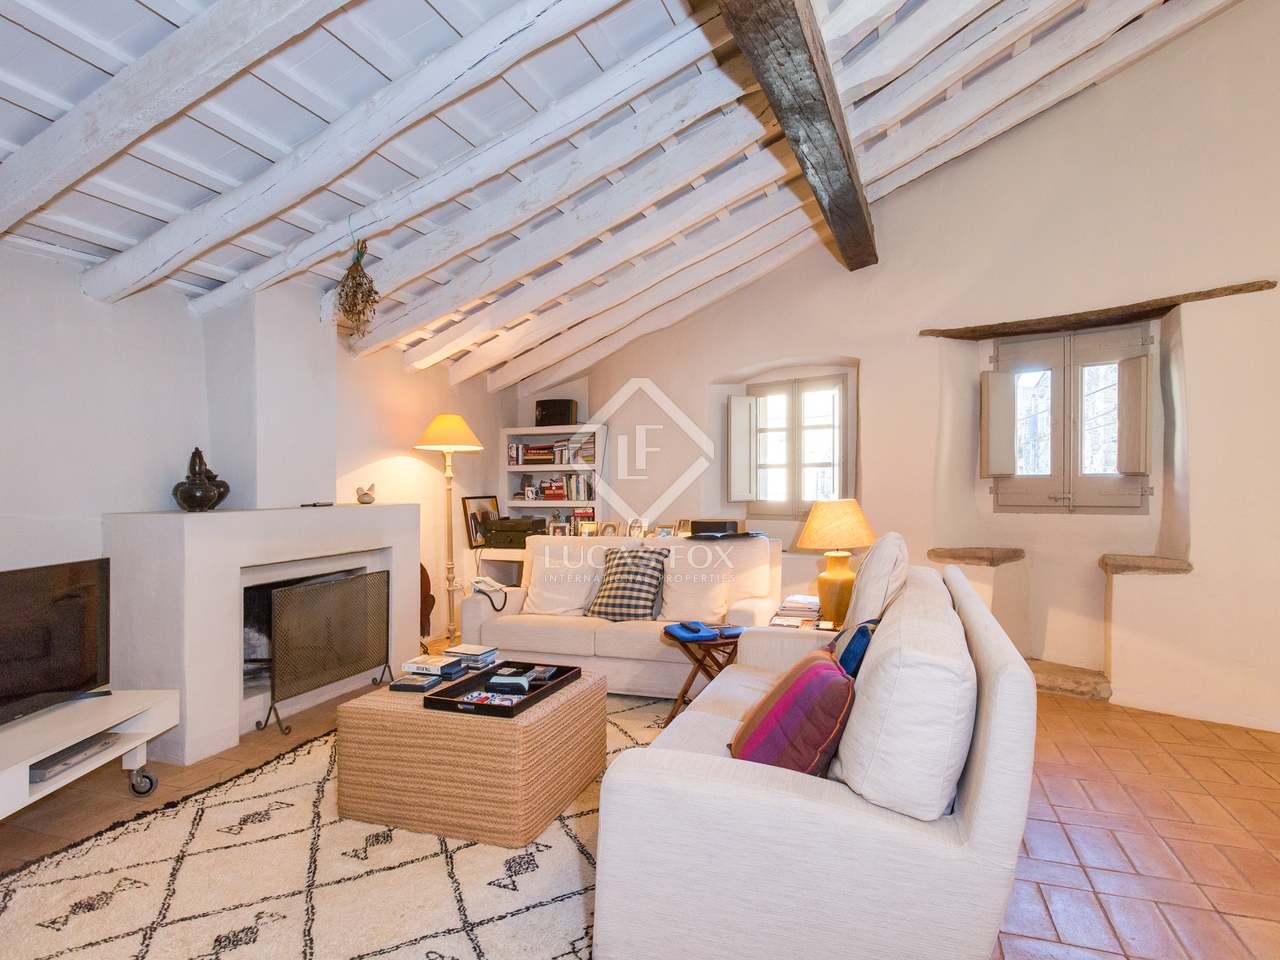 263m u00b2 Hus Villa till salu i Baix Emporda, Girona